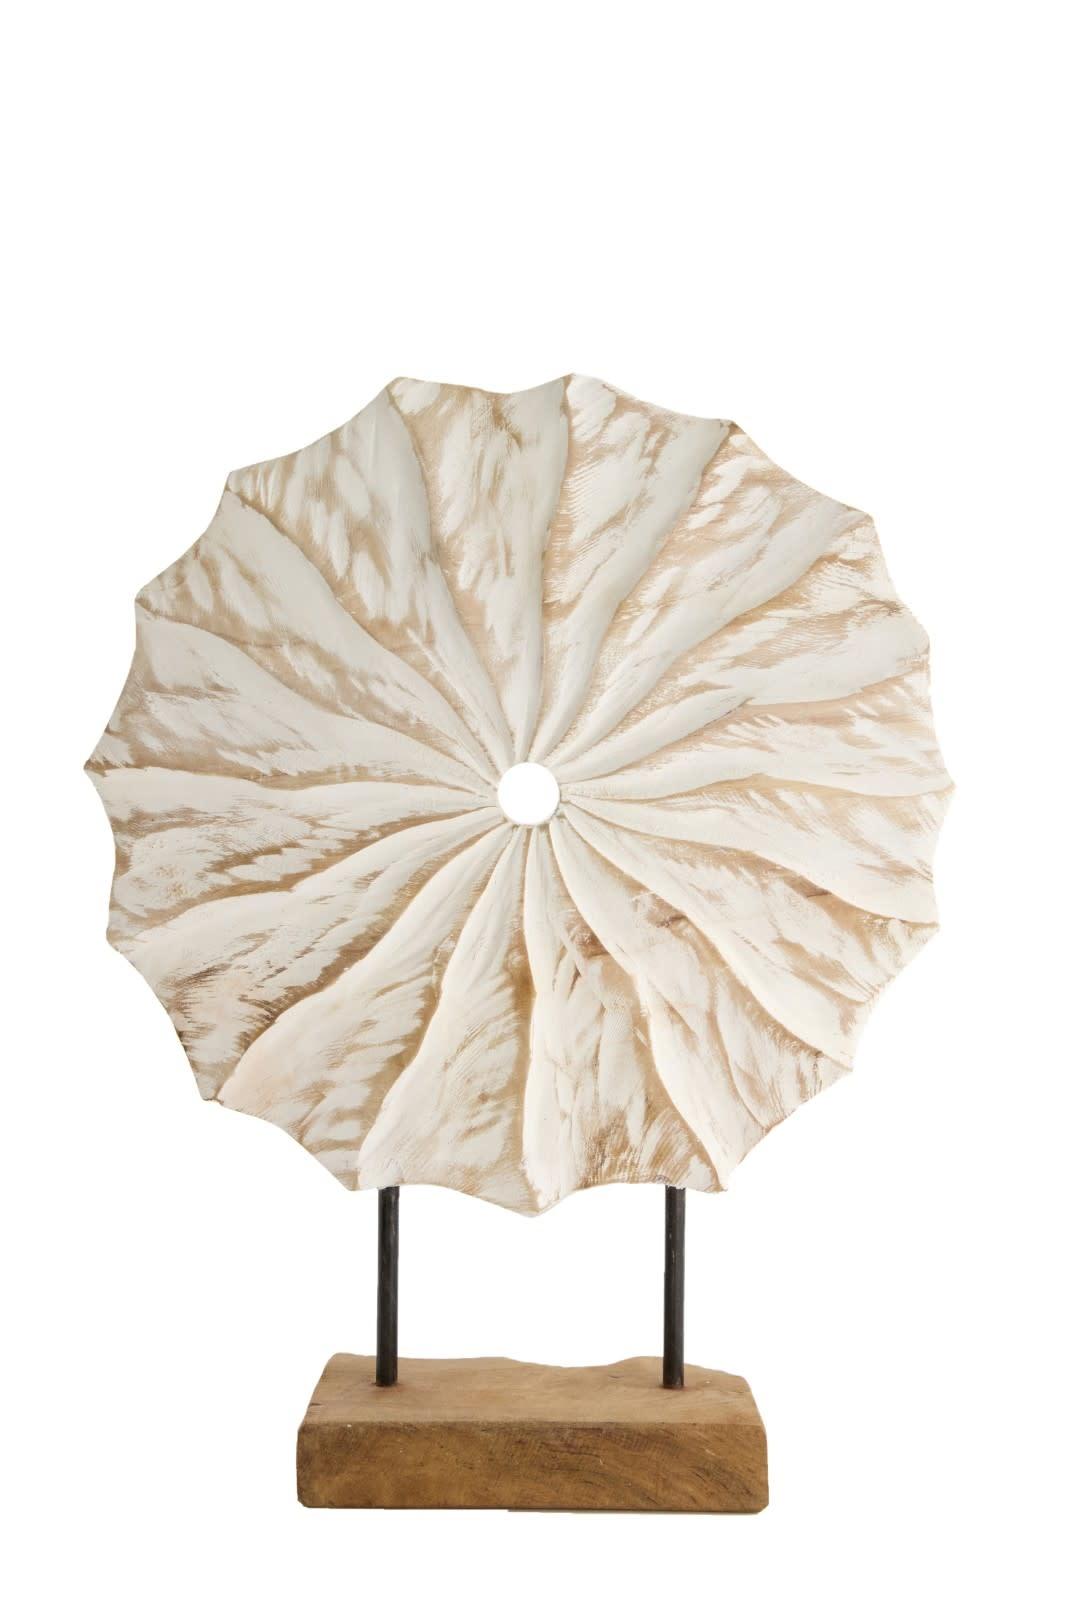 Dijk Carved Slice on Stand S Teak 30x9.5x39cm